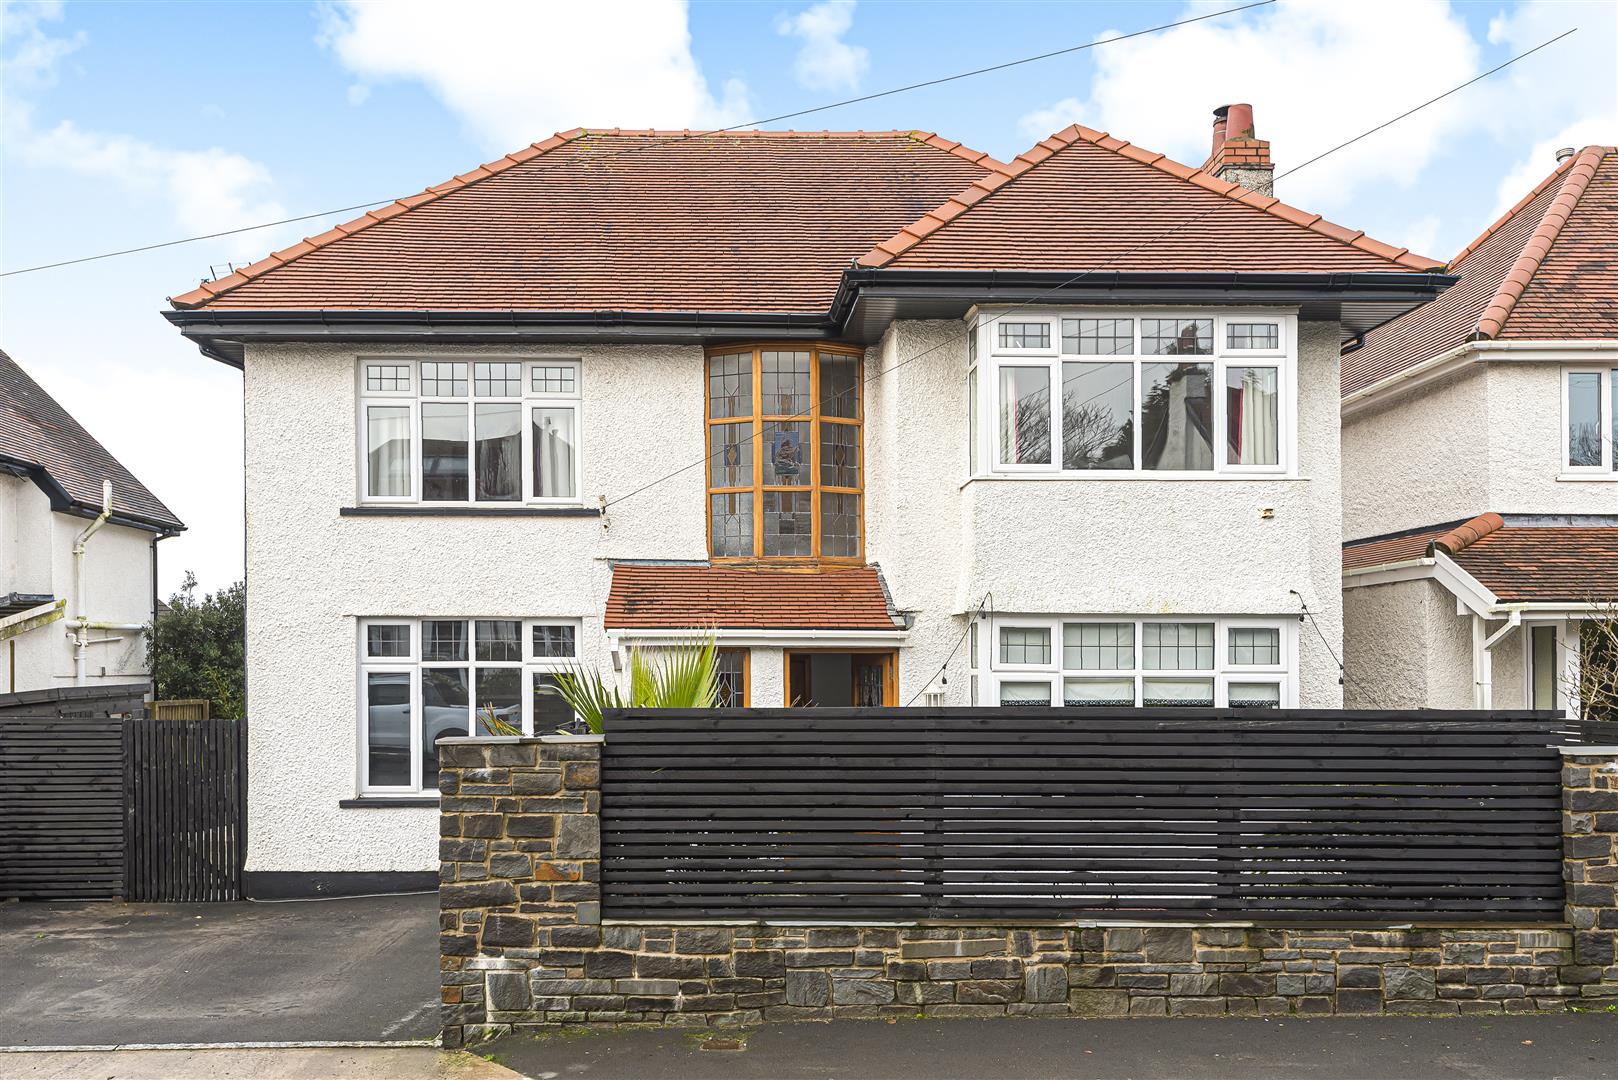 Caswell Avenue, Caswell, Swansea, SA3 4RU